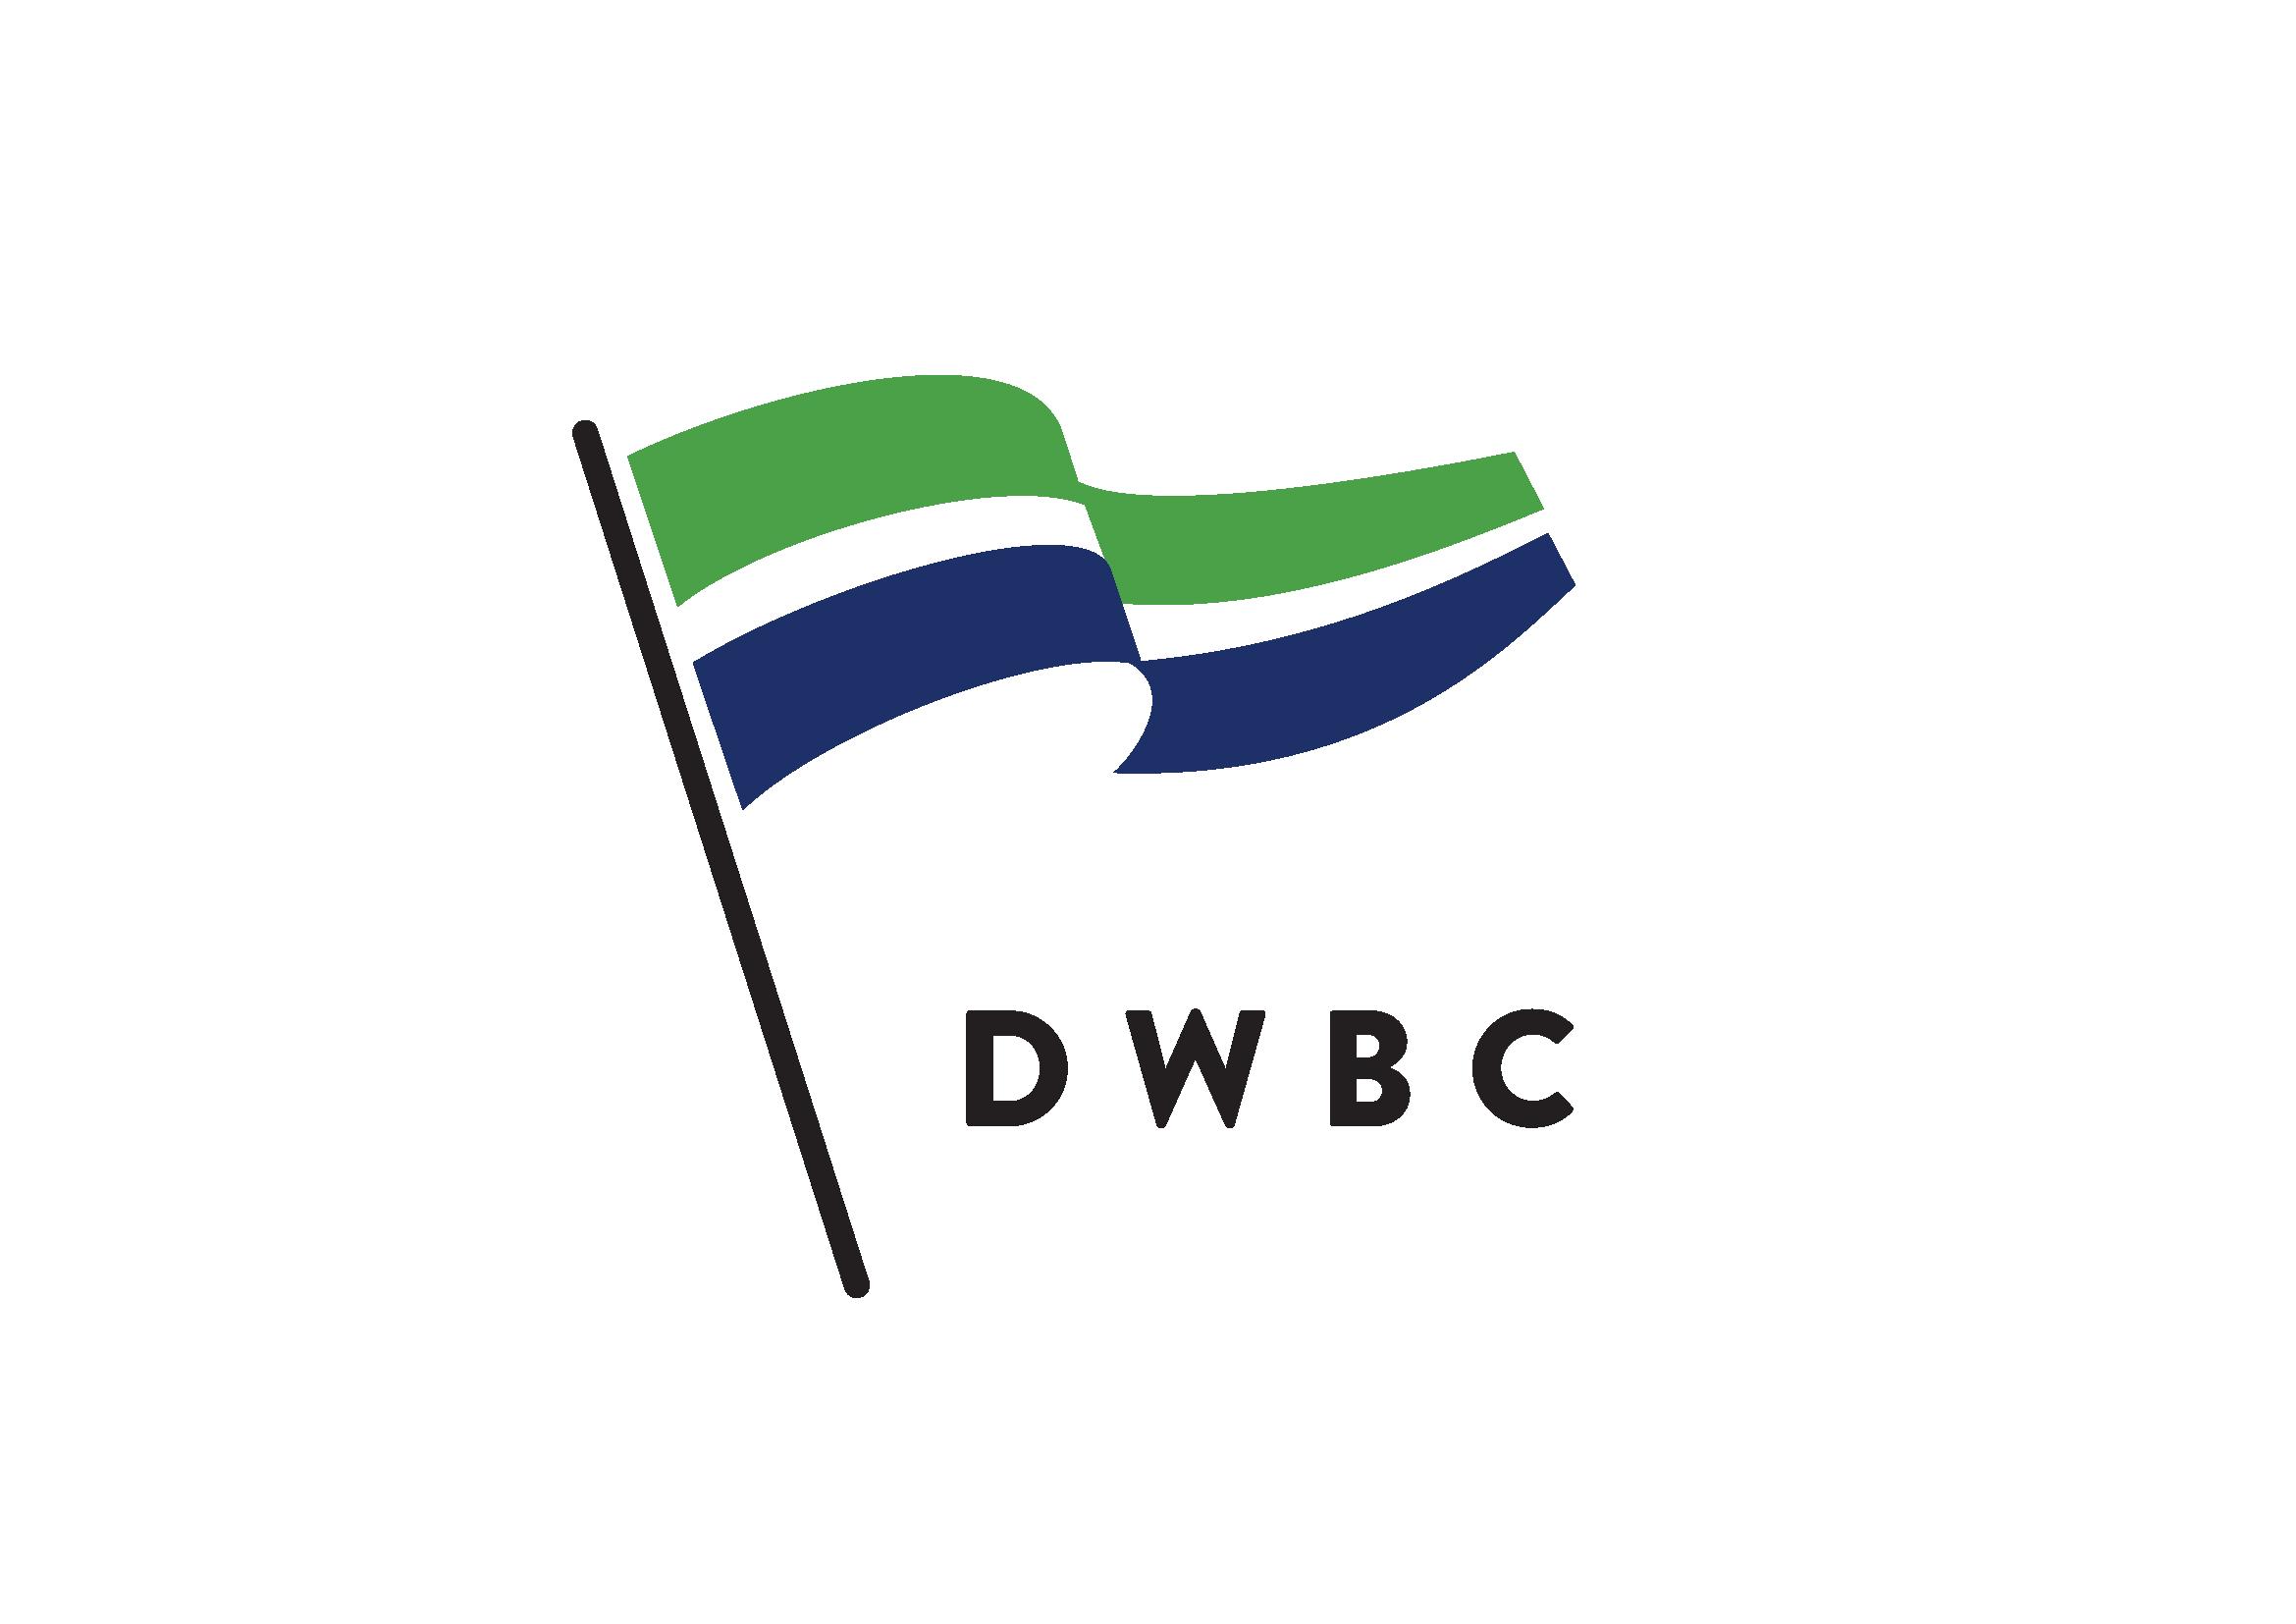 DWBC_Full_Colour.png